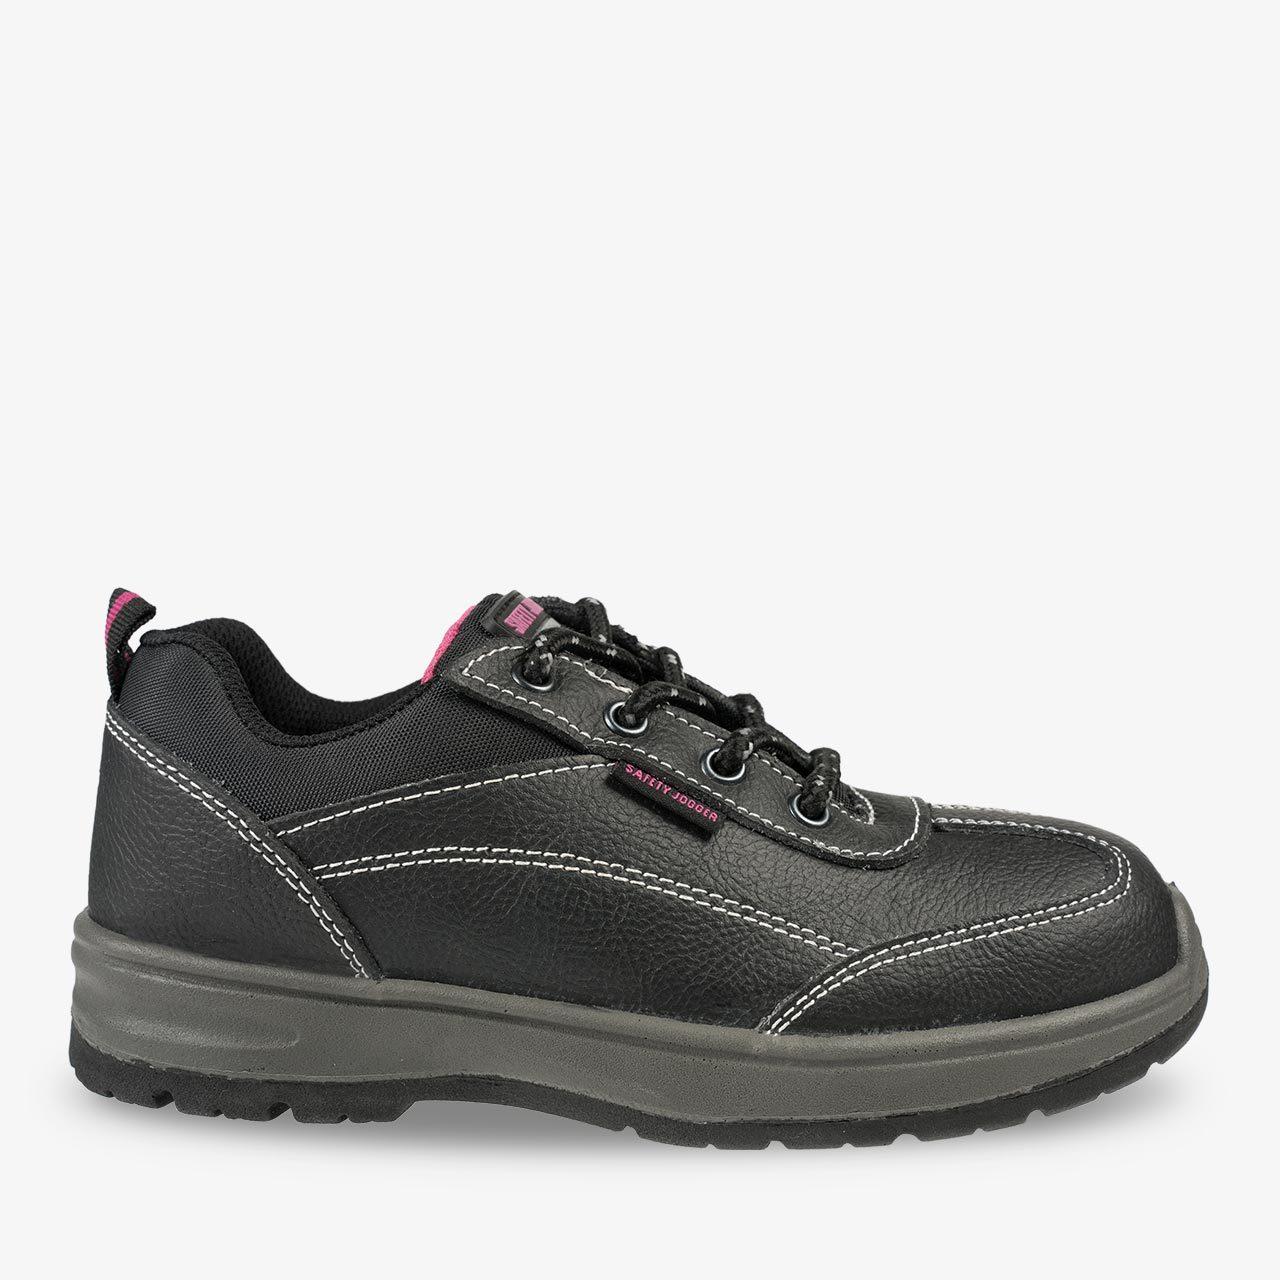 Chaussures de sécurité femme BESTGIRL